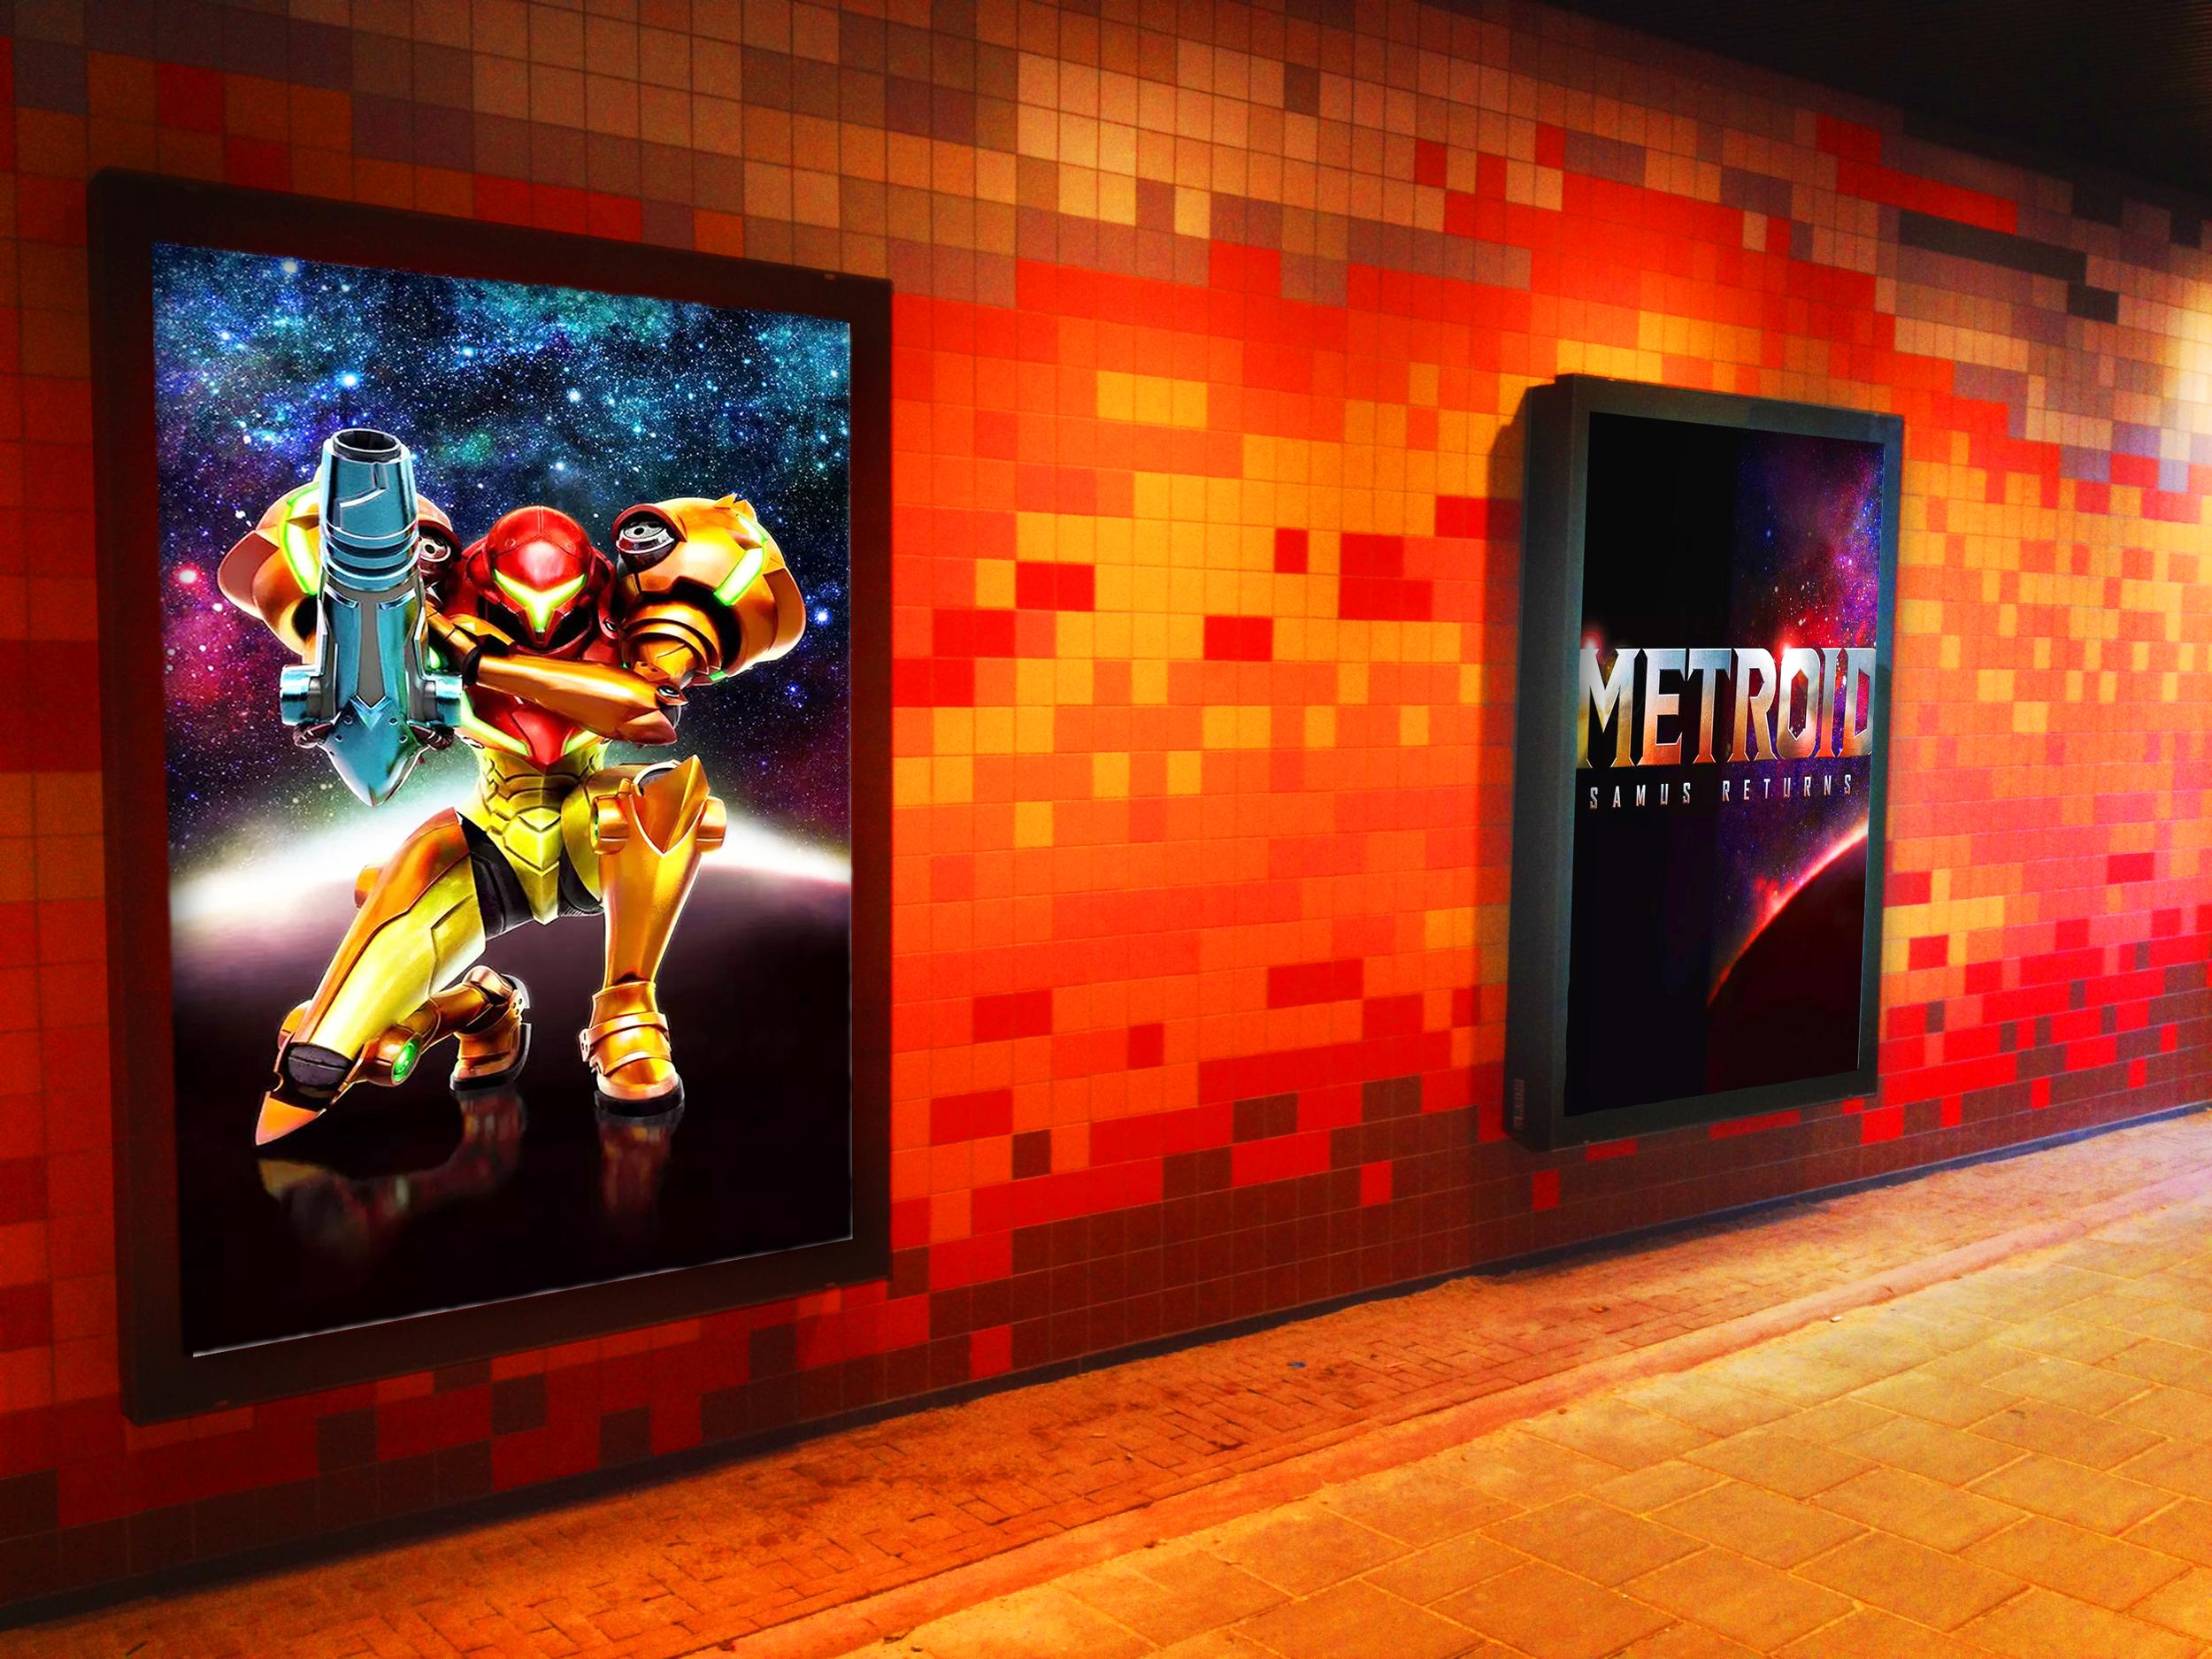 Metroid Metro